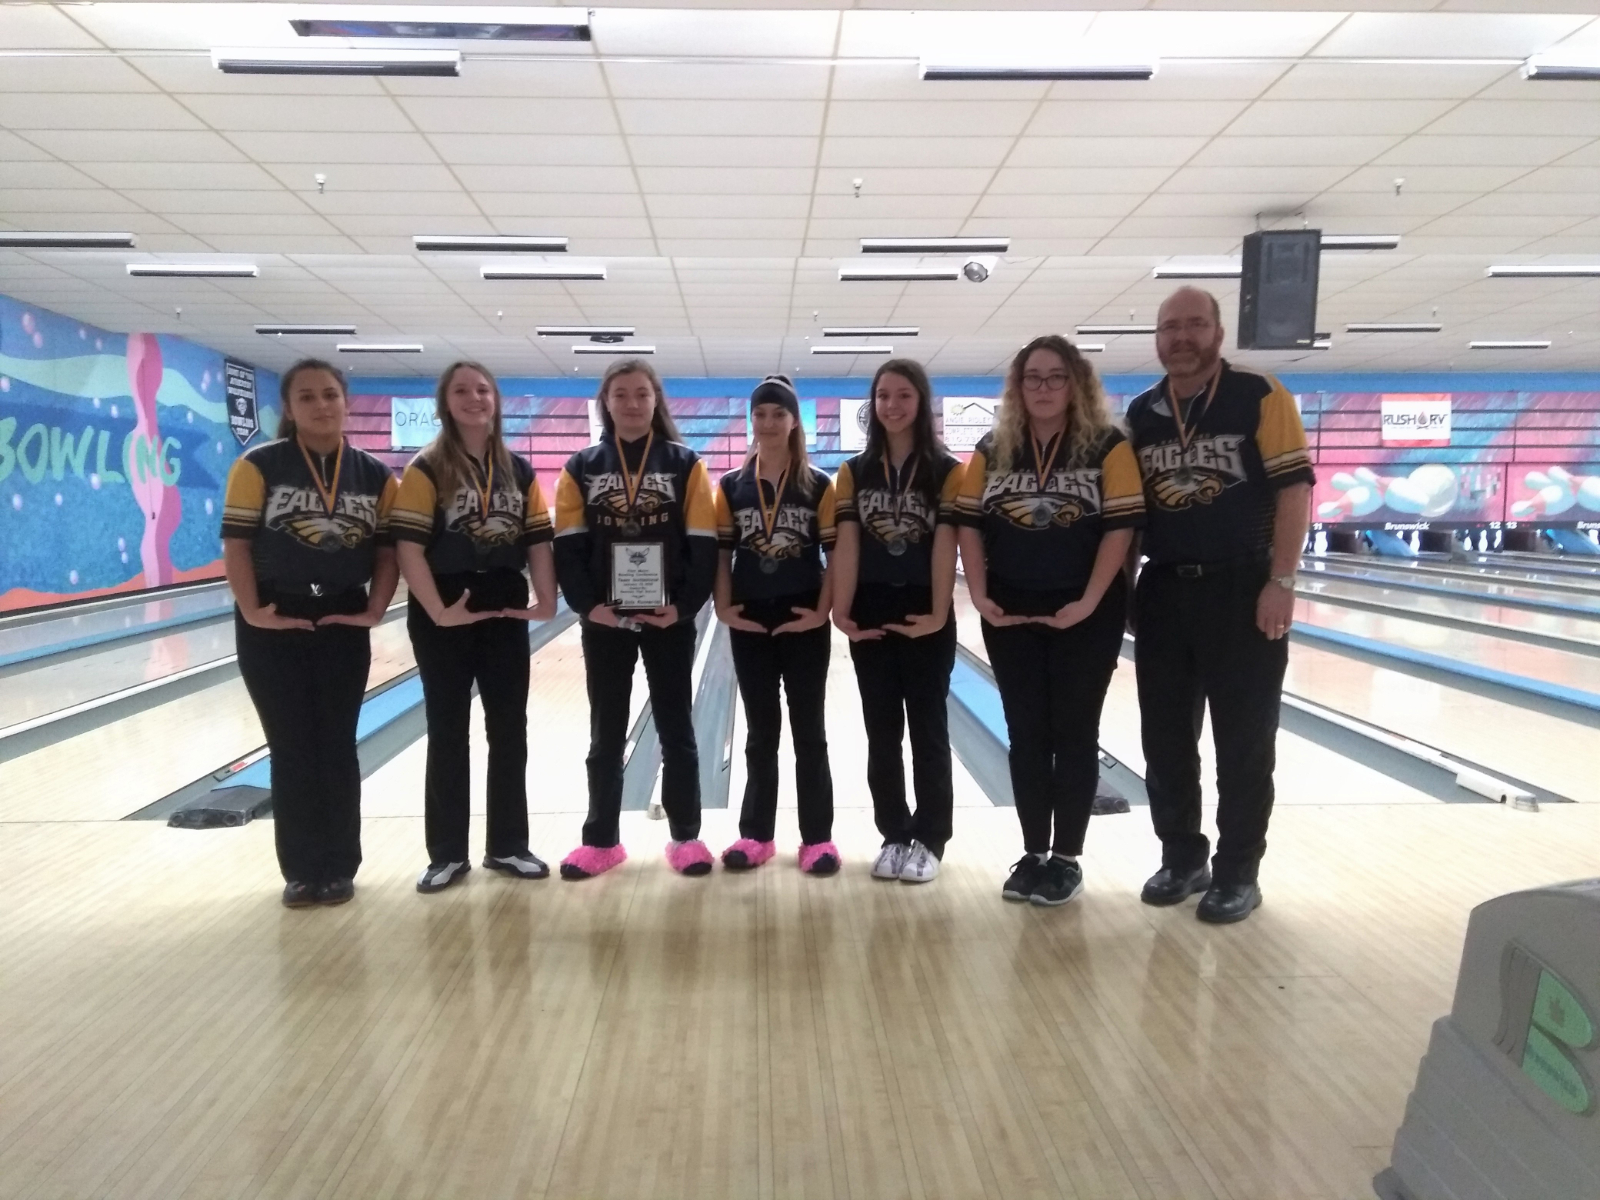 Hartland Girls' Bowling Team Second at Flint Metro Invitational